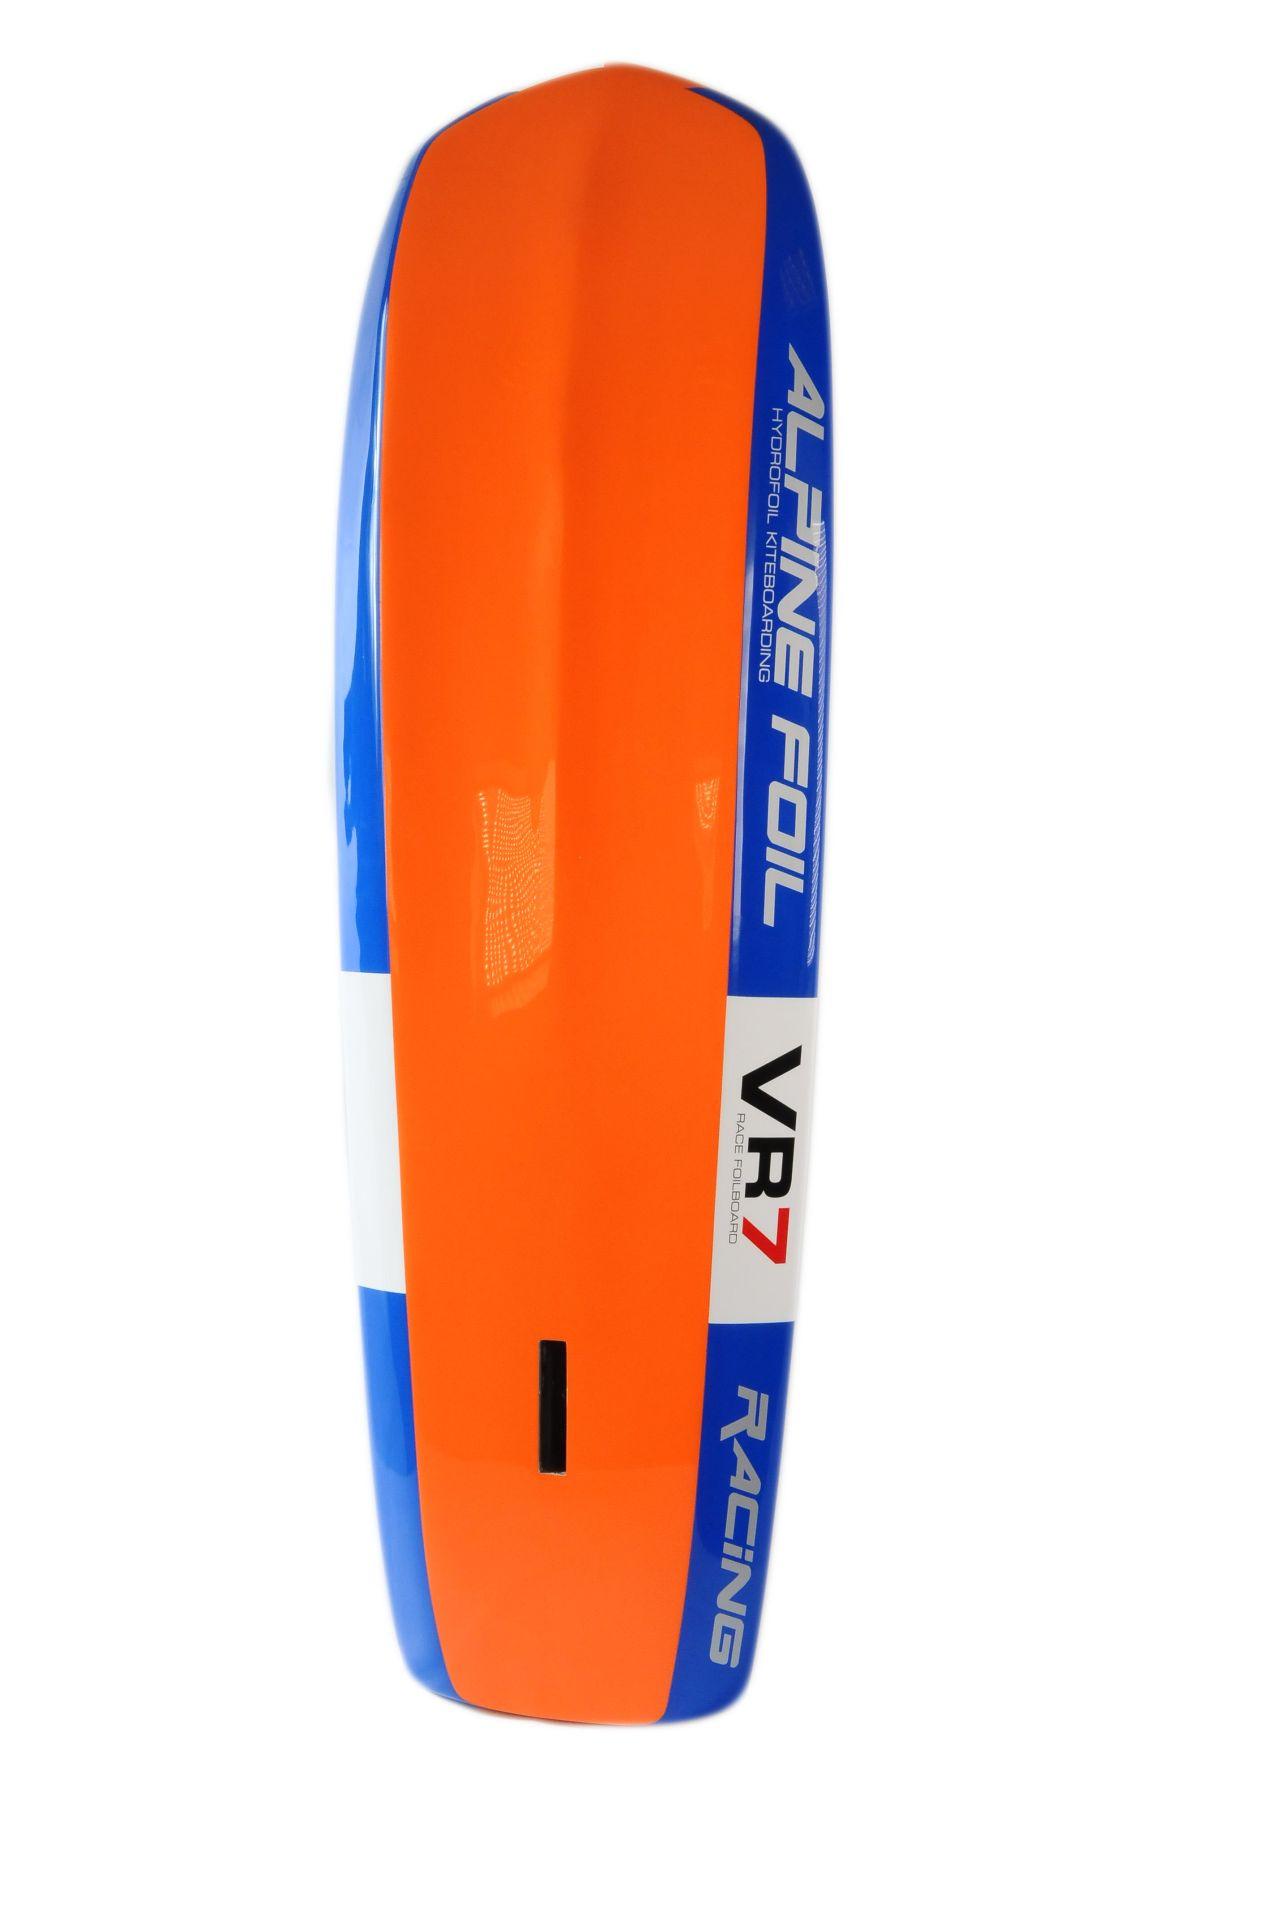 Kitefoil foilboard alpinefoil vr7 3 2